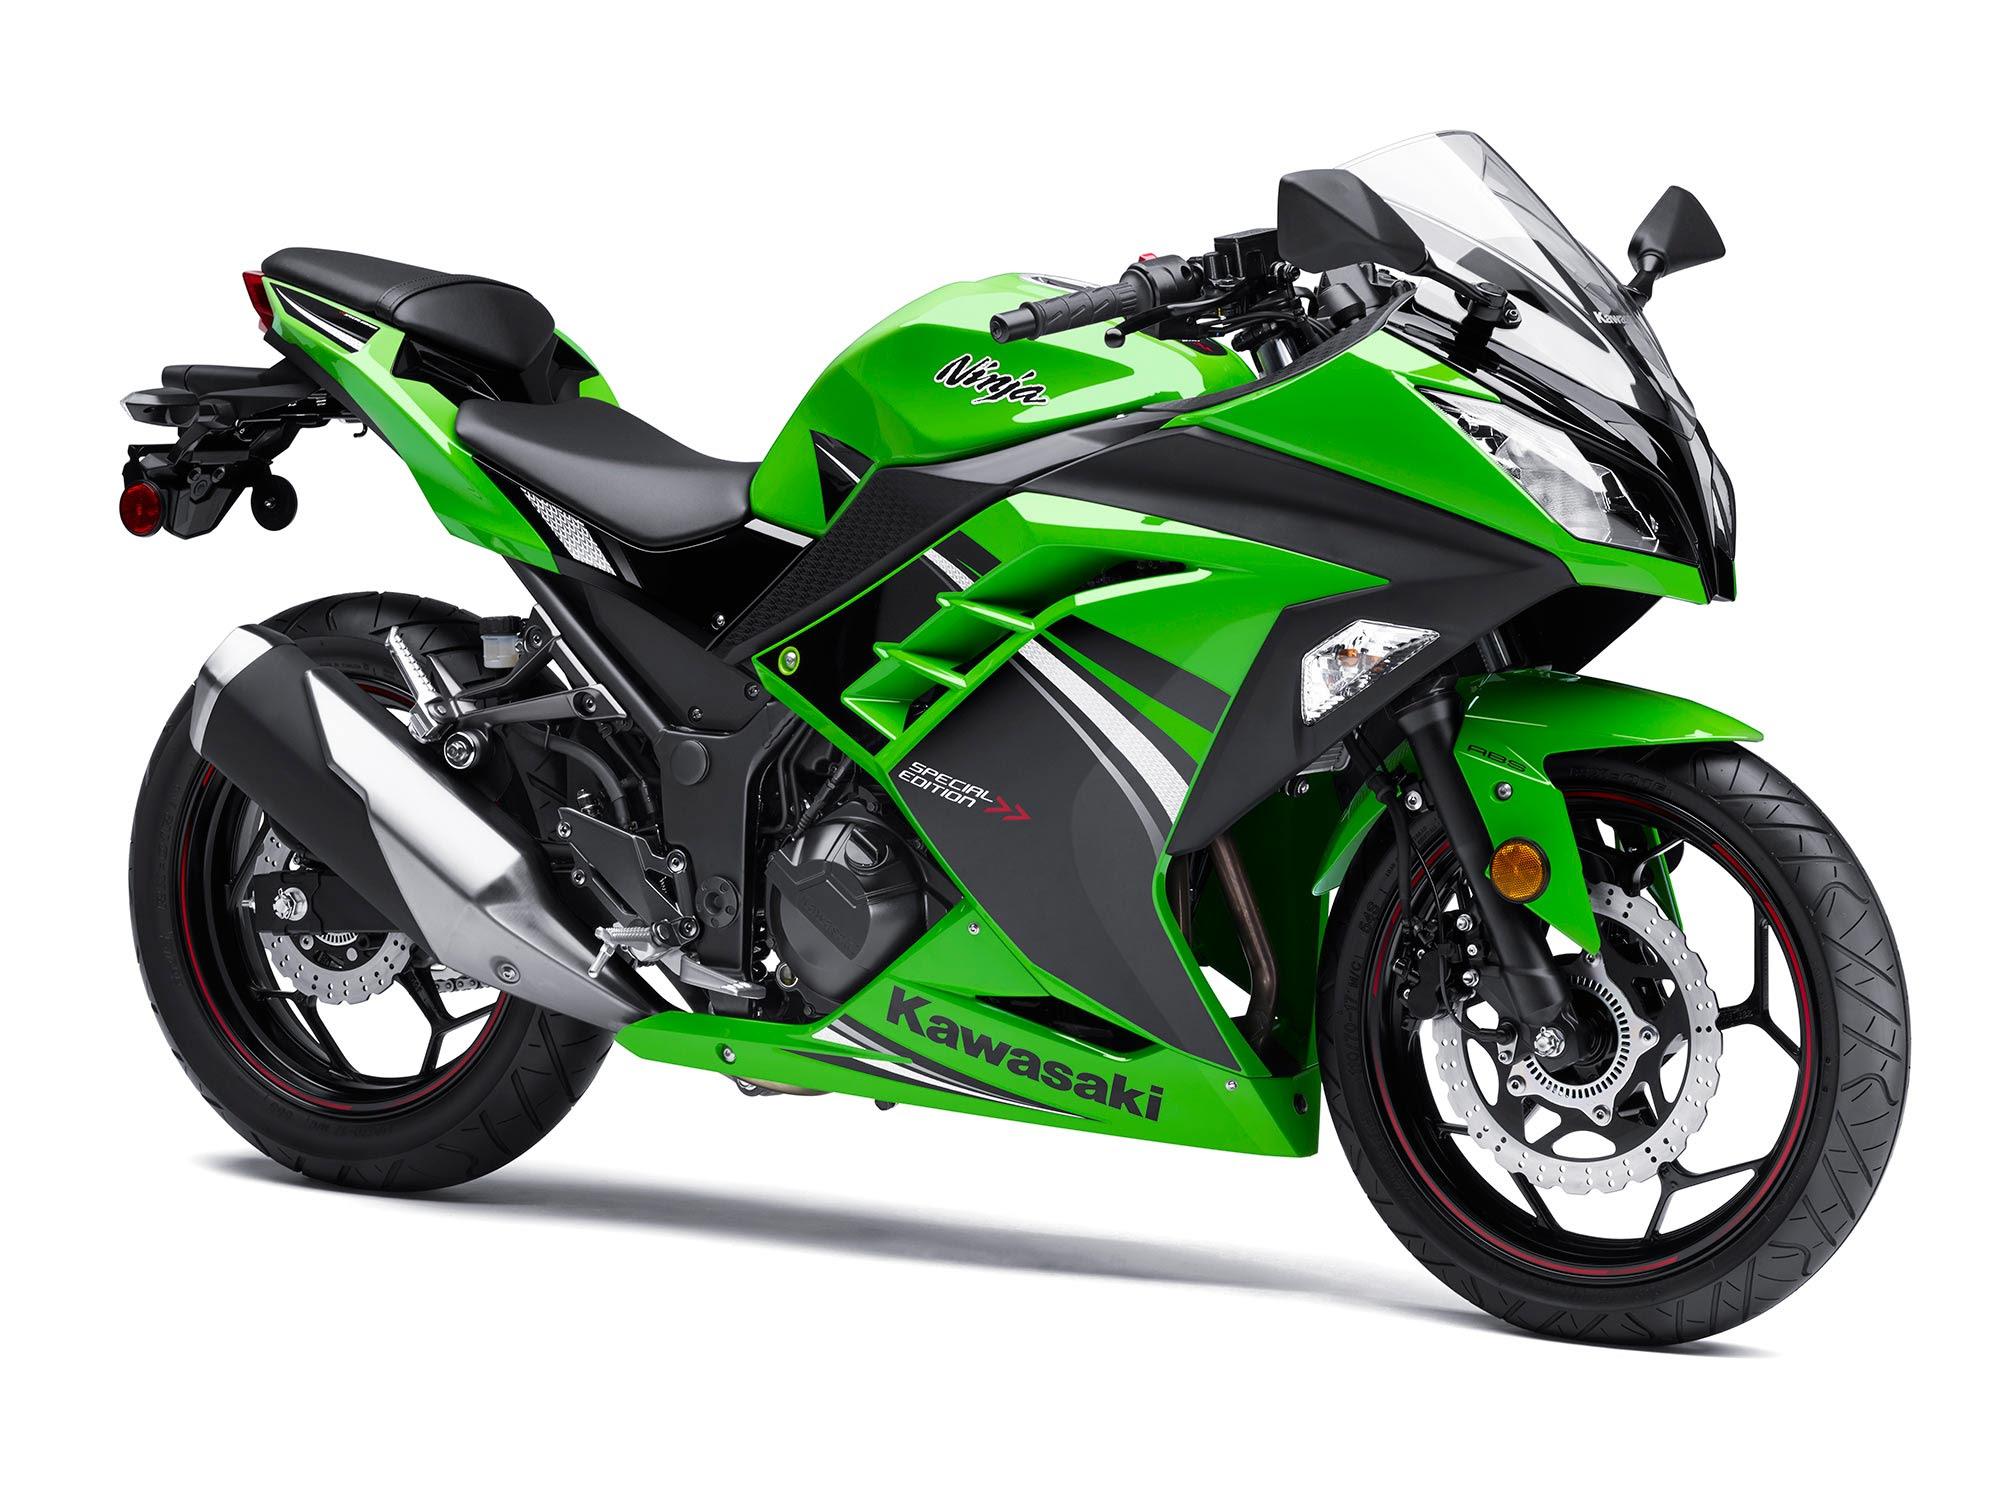 Motorcycle Update Kawasaki Ninja 300 With Price